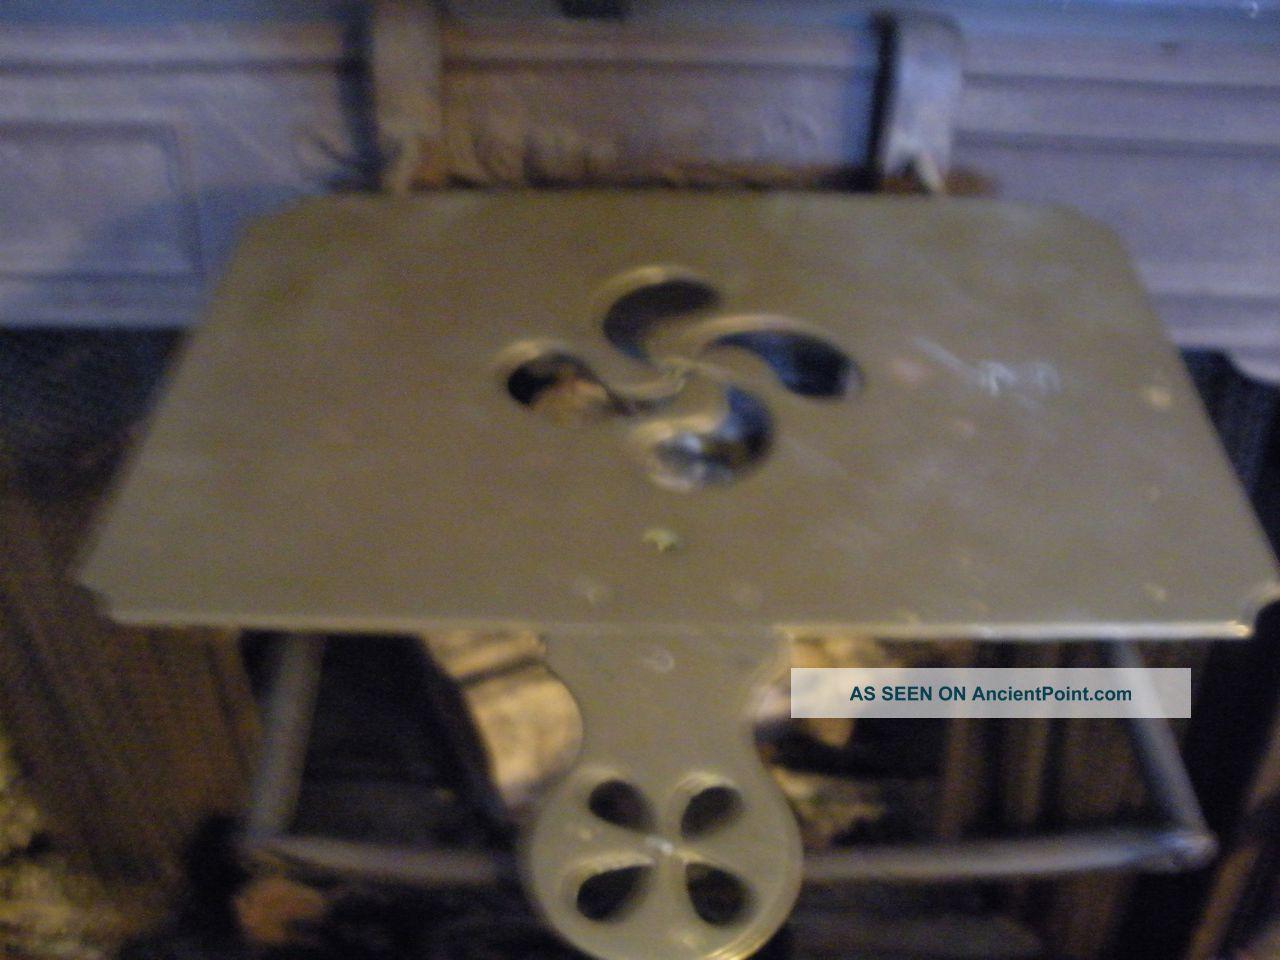 Antique Iron Brass Kettle Fireplace Trivet Fireside Bracket Stand Hearth Fender Trivets photo